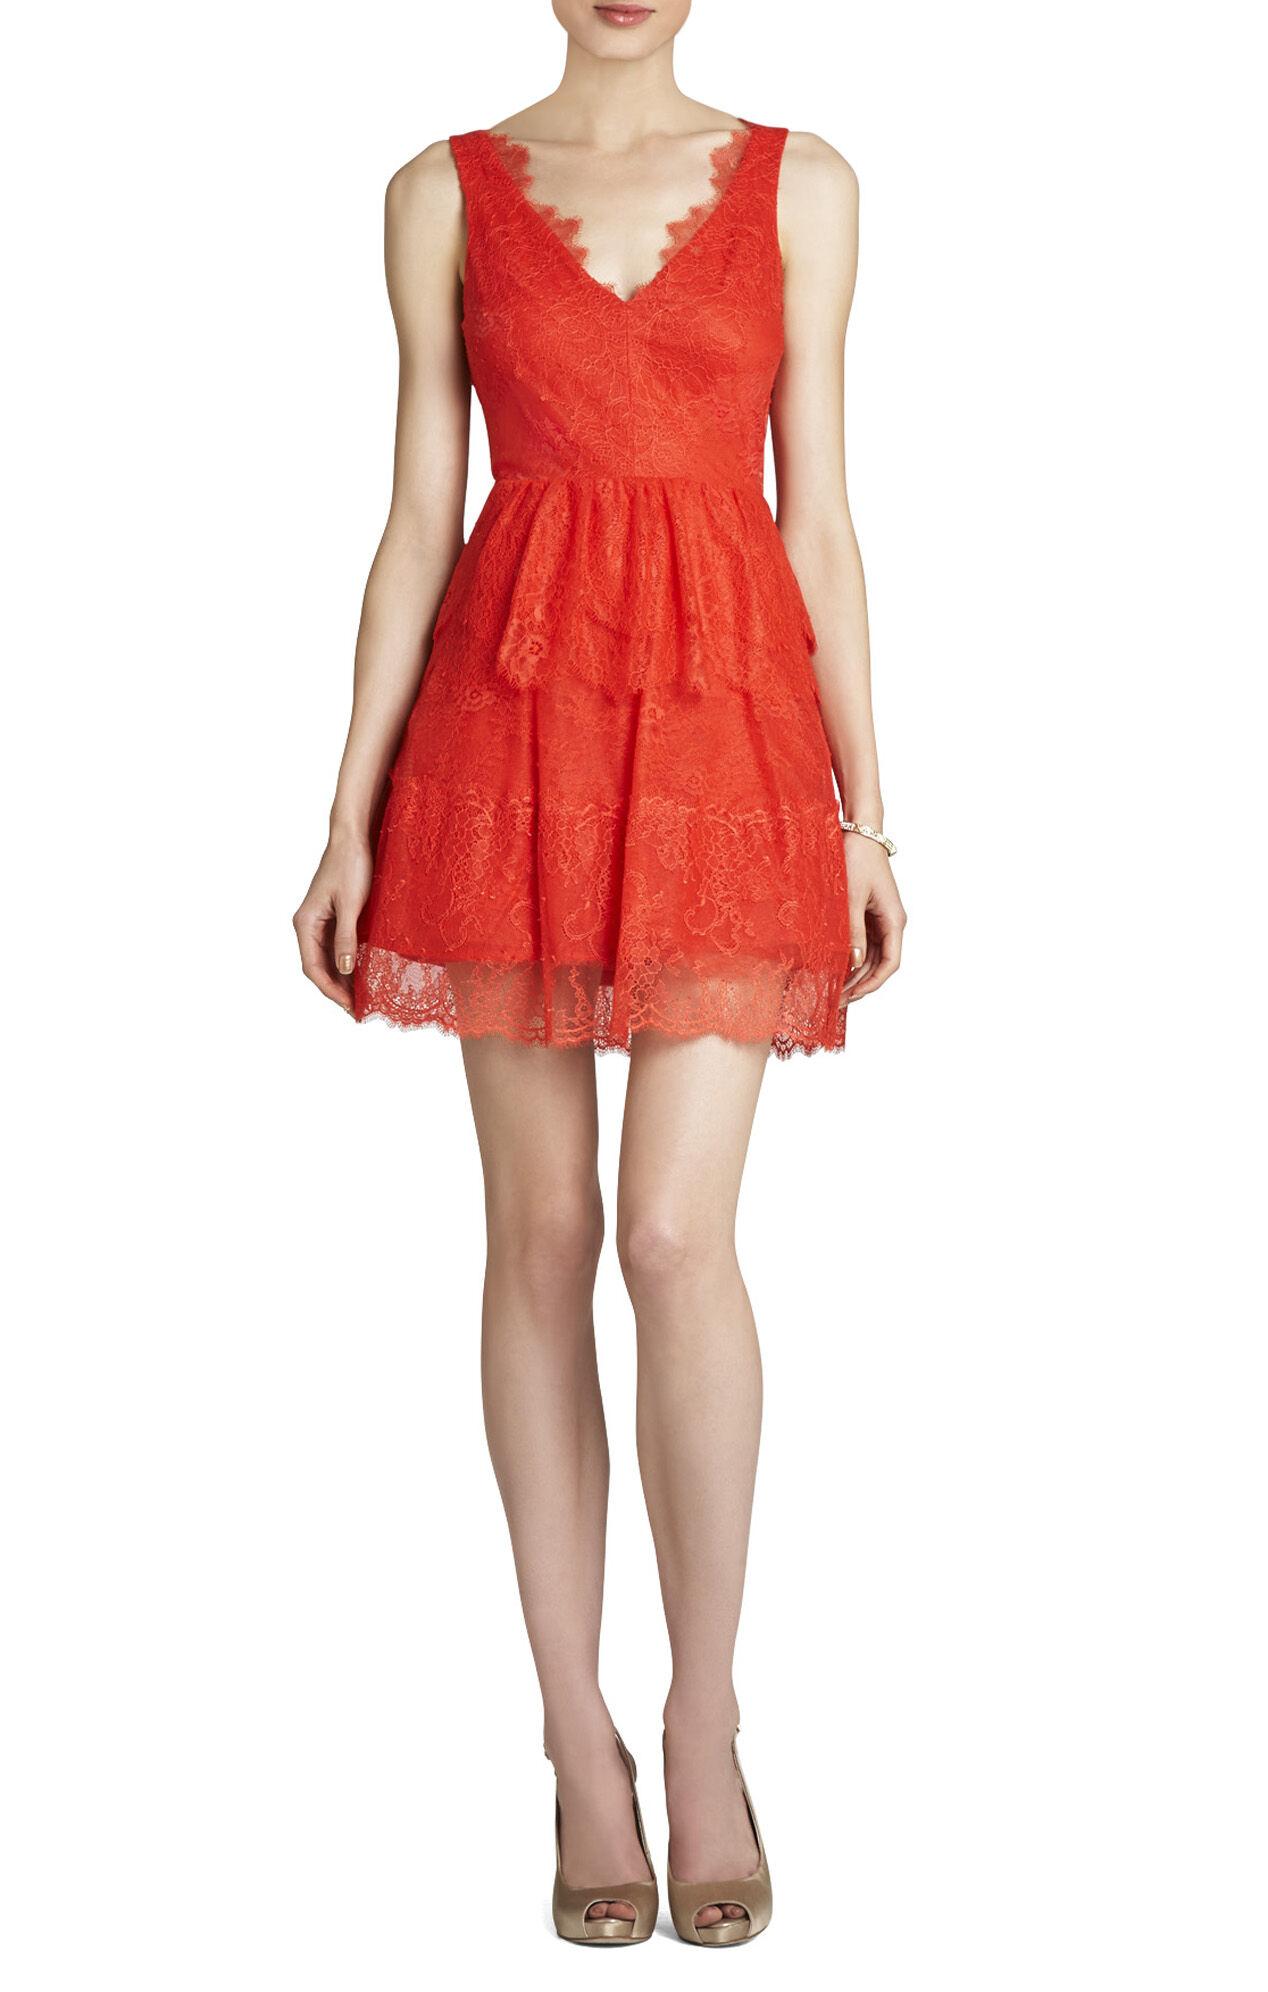 BCBGMAXAZRIA Willa Lace Dress | BCBG.com